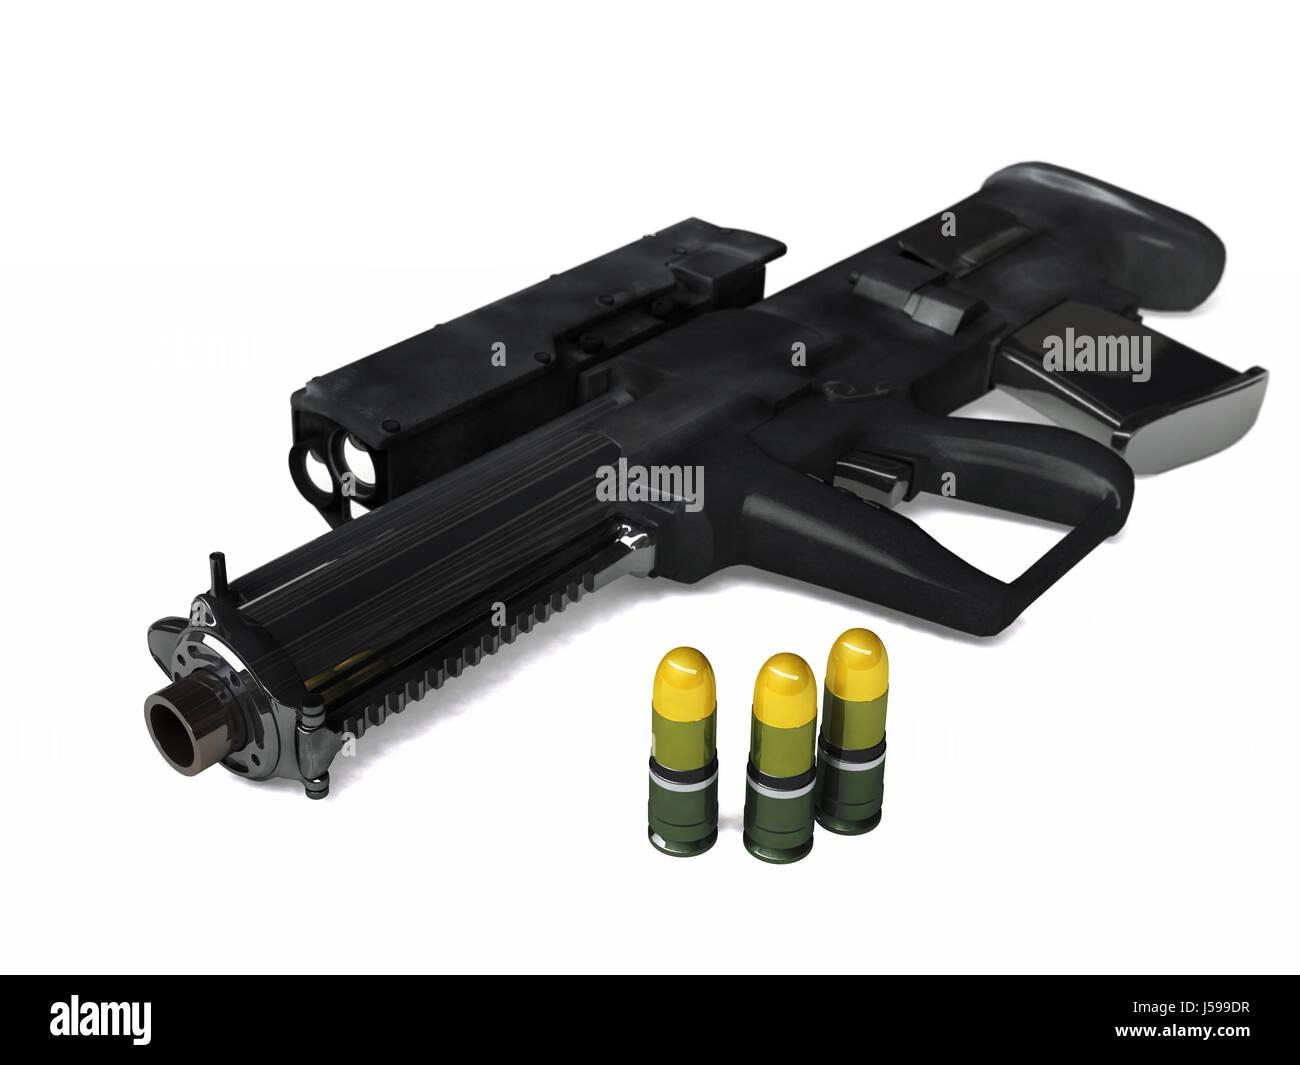 Fire Grenade Stock Photos & Fire Grenade Stock Images - Alamy